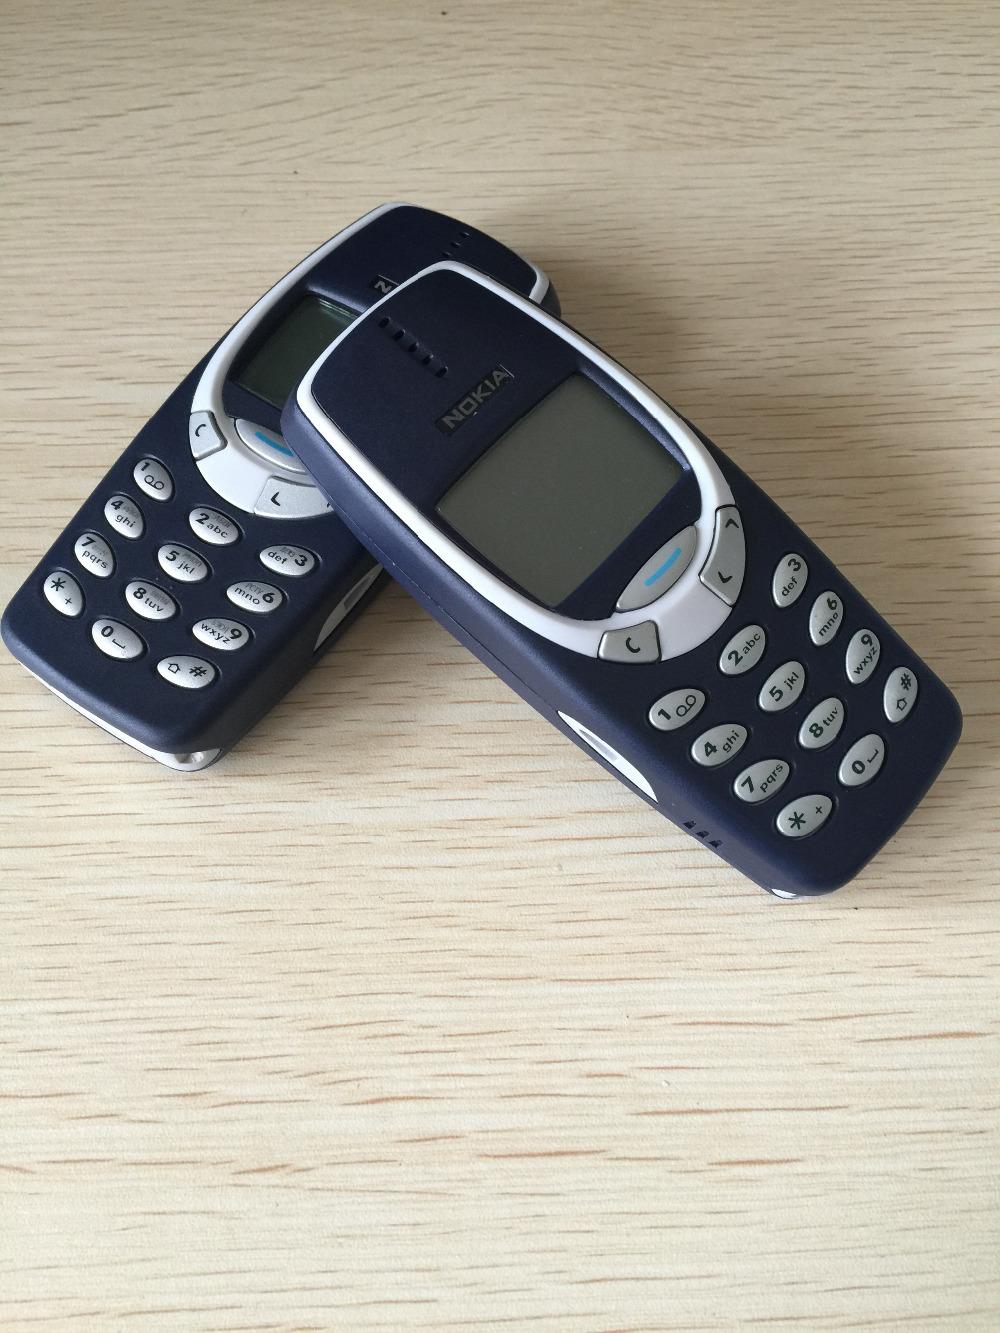 Refurbished phone Nokia 3310 cheap phone unlocked GSM 900/1800 with multi language dark blue 4